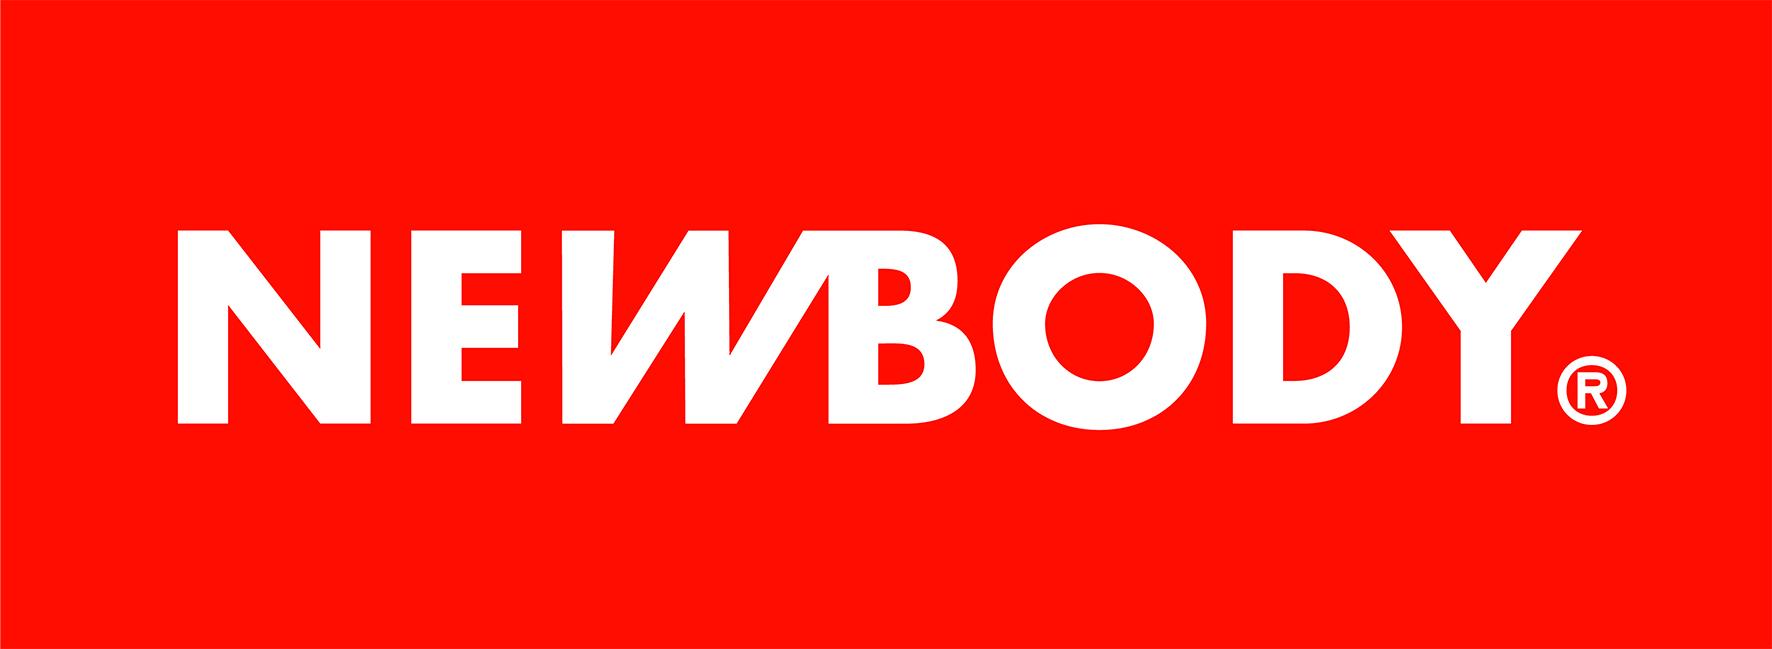 http://stadicup.fi/wp-content/uploads/2020/03/Newbody_logo_b_PMS.jpg